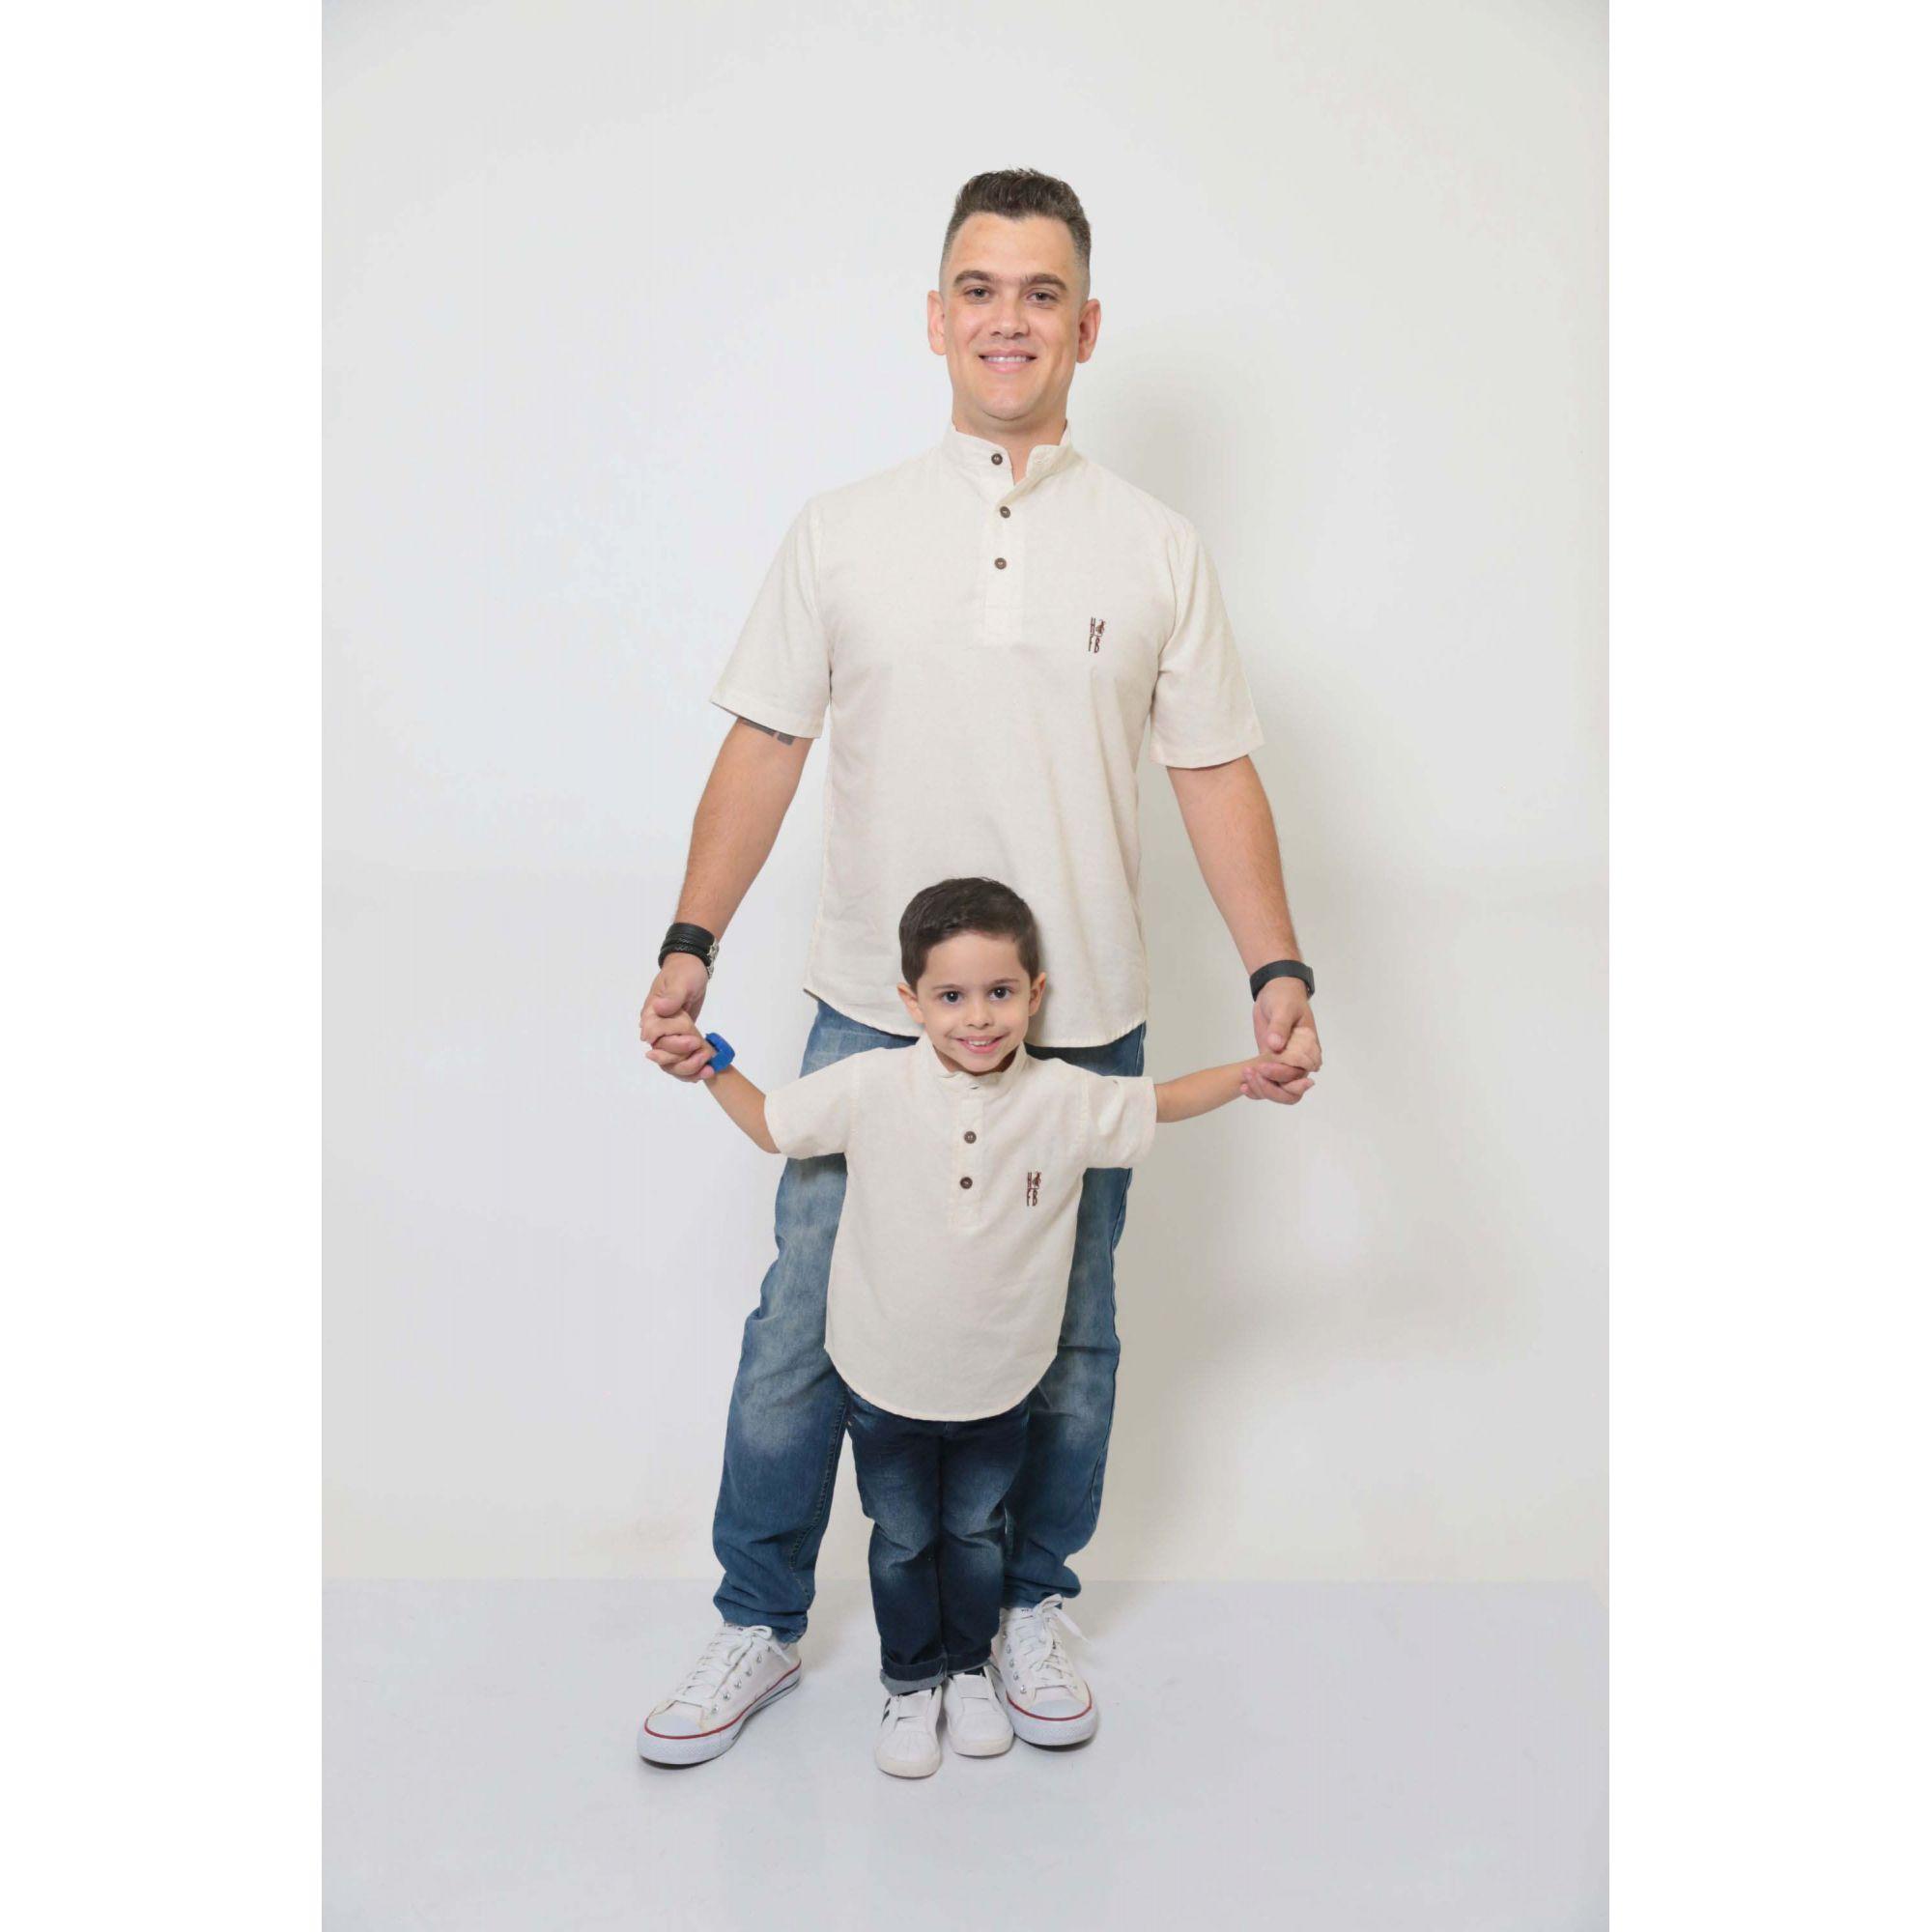 PAI E FILHO > Kit 02 Camisas Bata Gola Padre [Coleção Tal Pai Tal Filho]